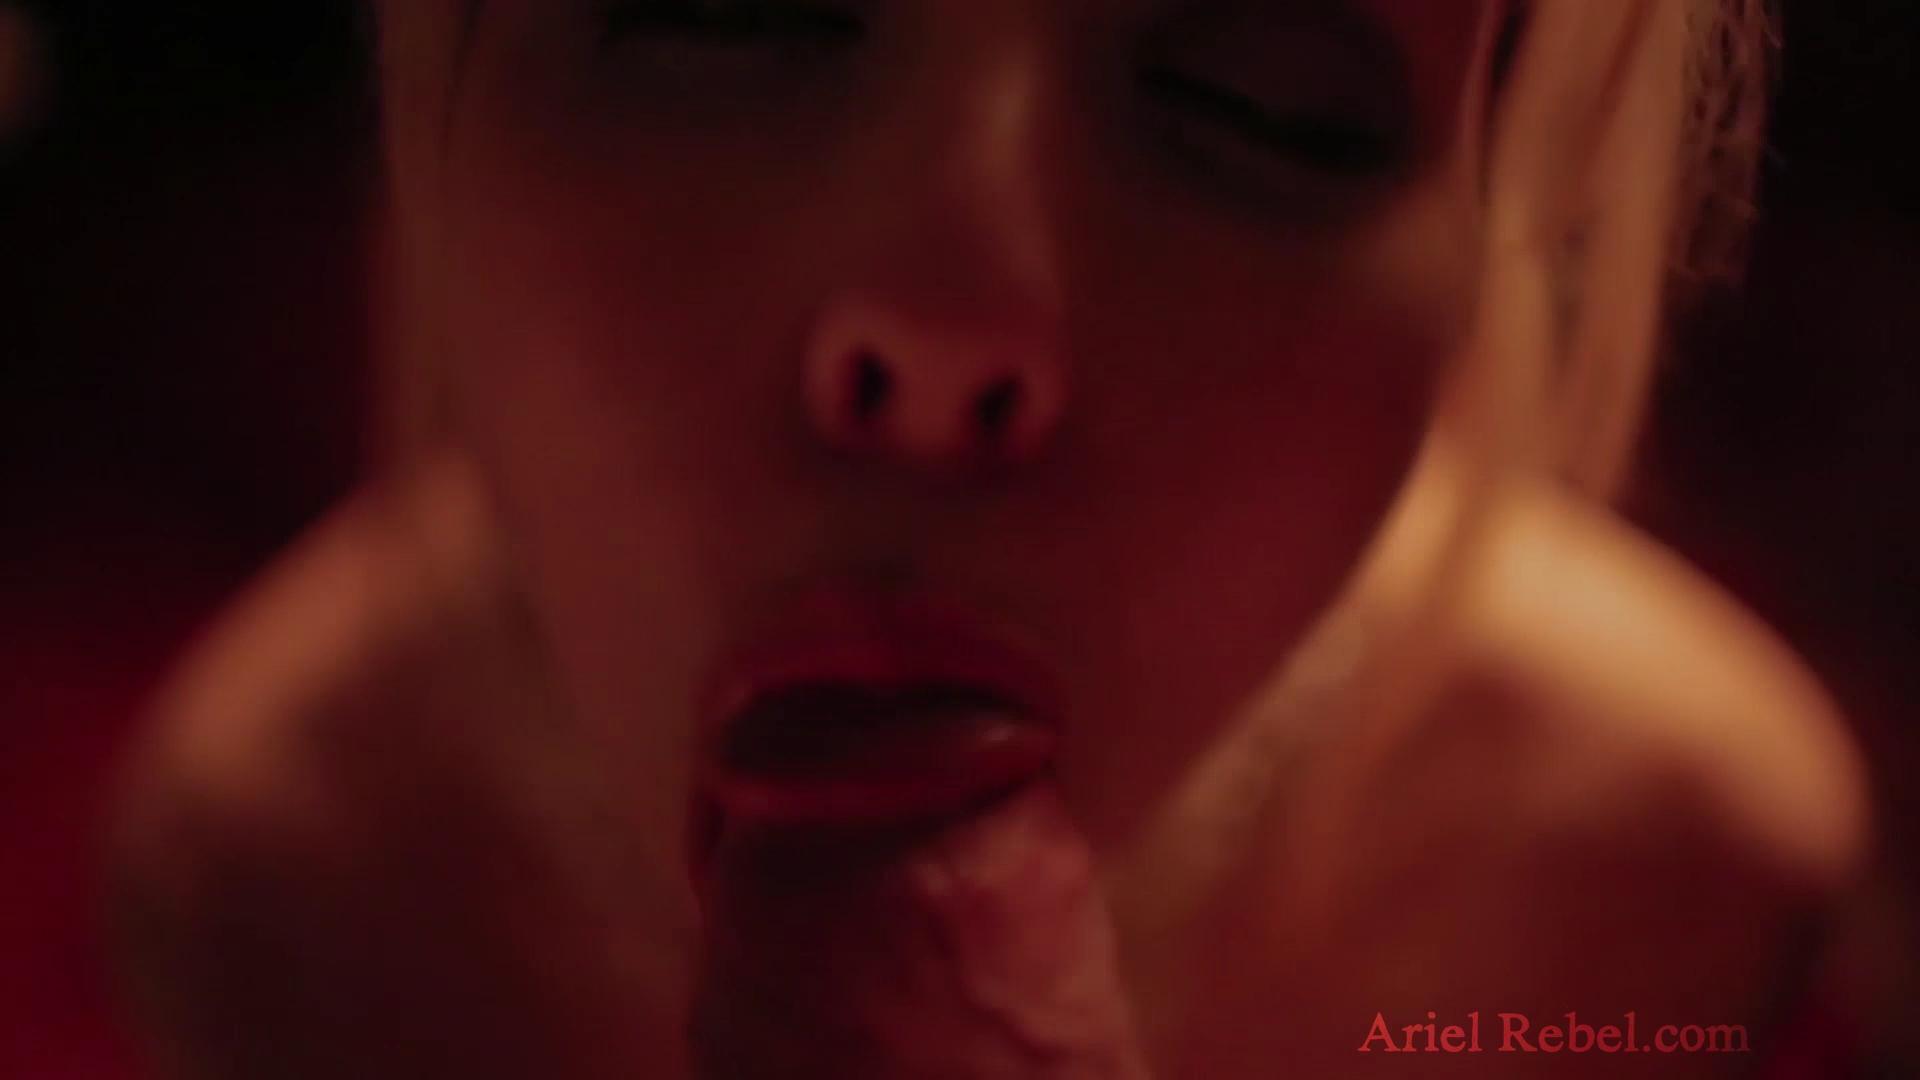 Omfg Sexy Ariel Rebel Finally In A Blowjob Video  Nude Amateur Girls-7140